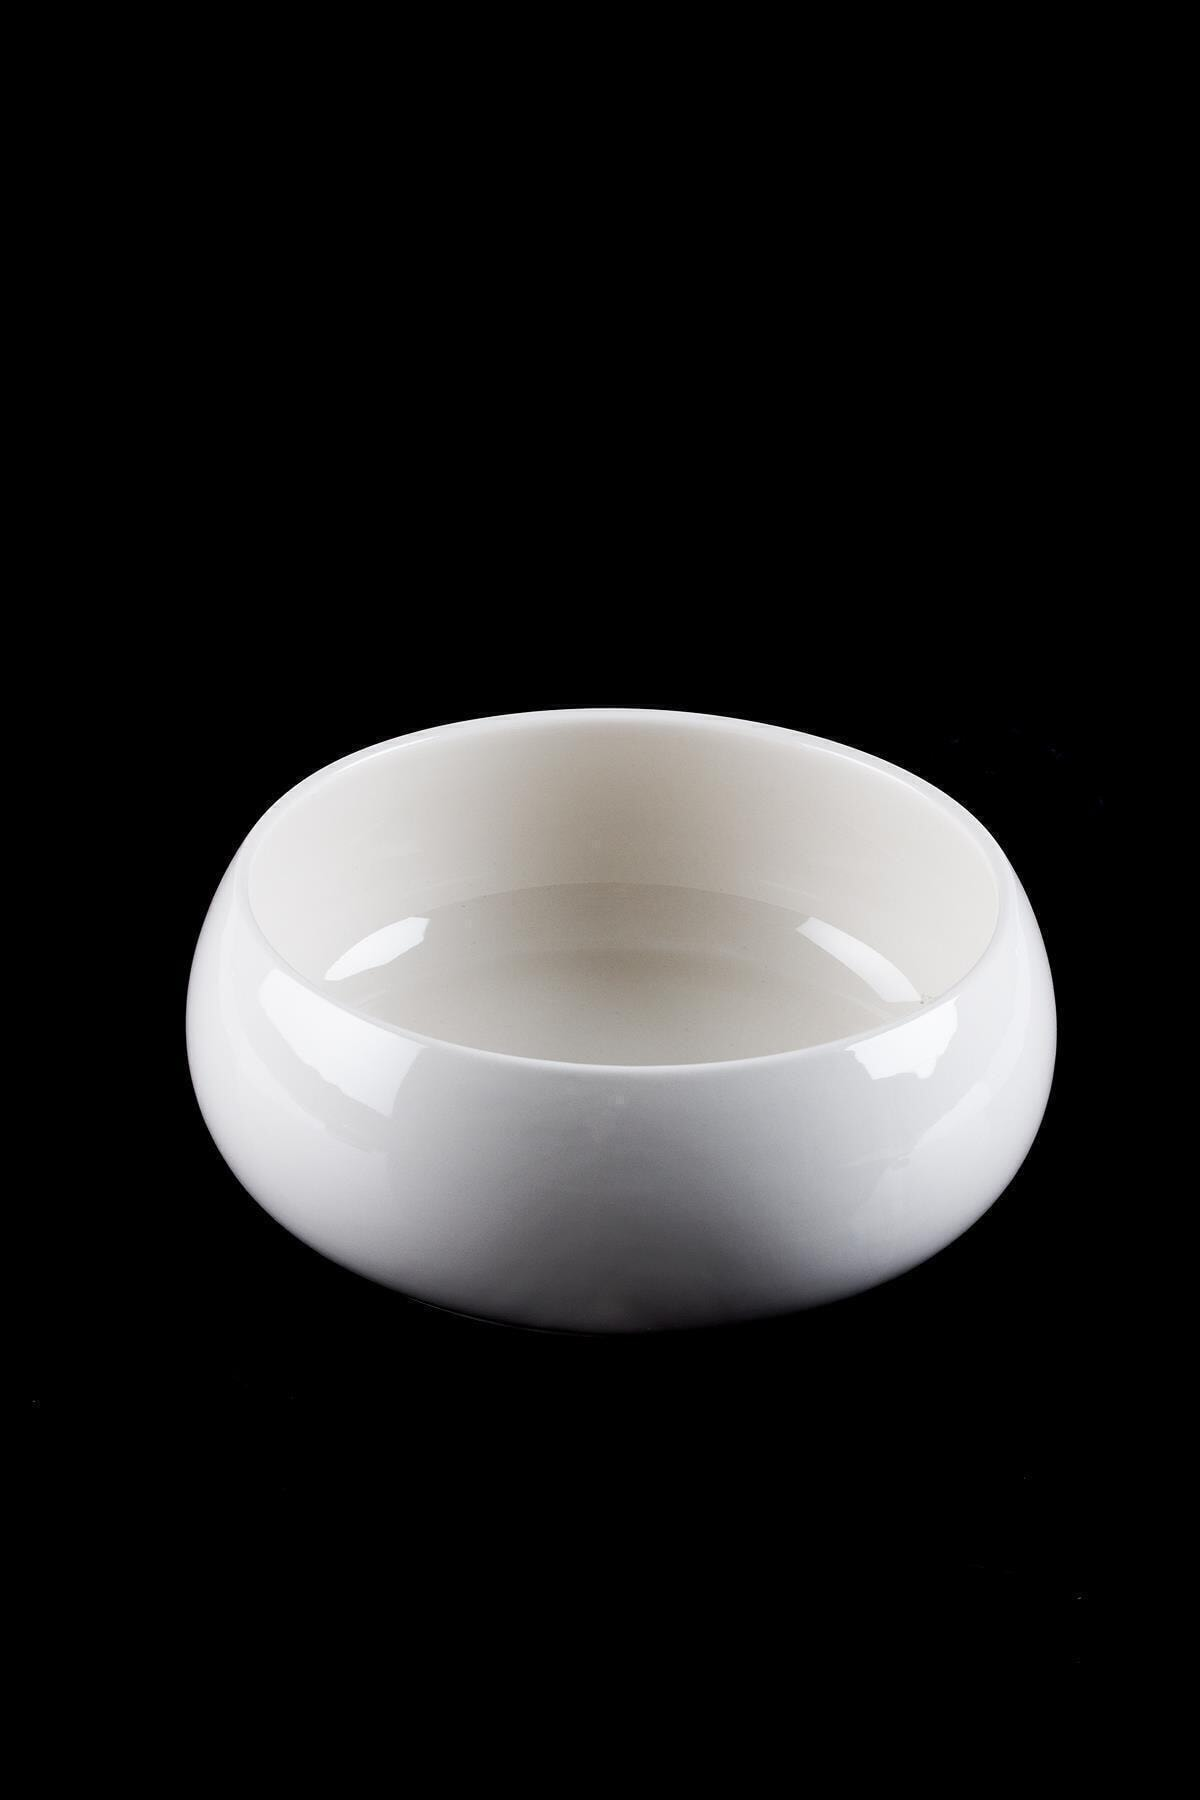 ACAR Bianco Perla Porselen Bombeli Yuvarlak Kase - 21.5 Cm 1